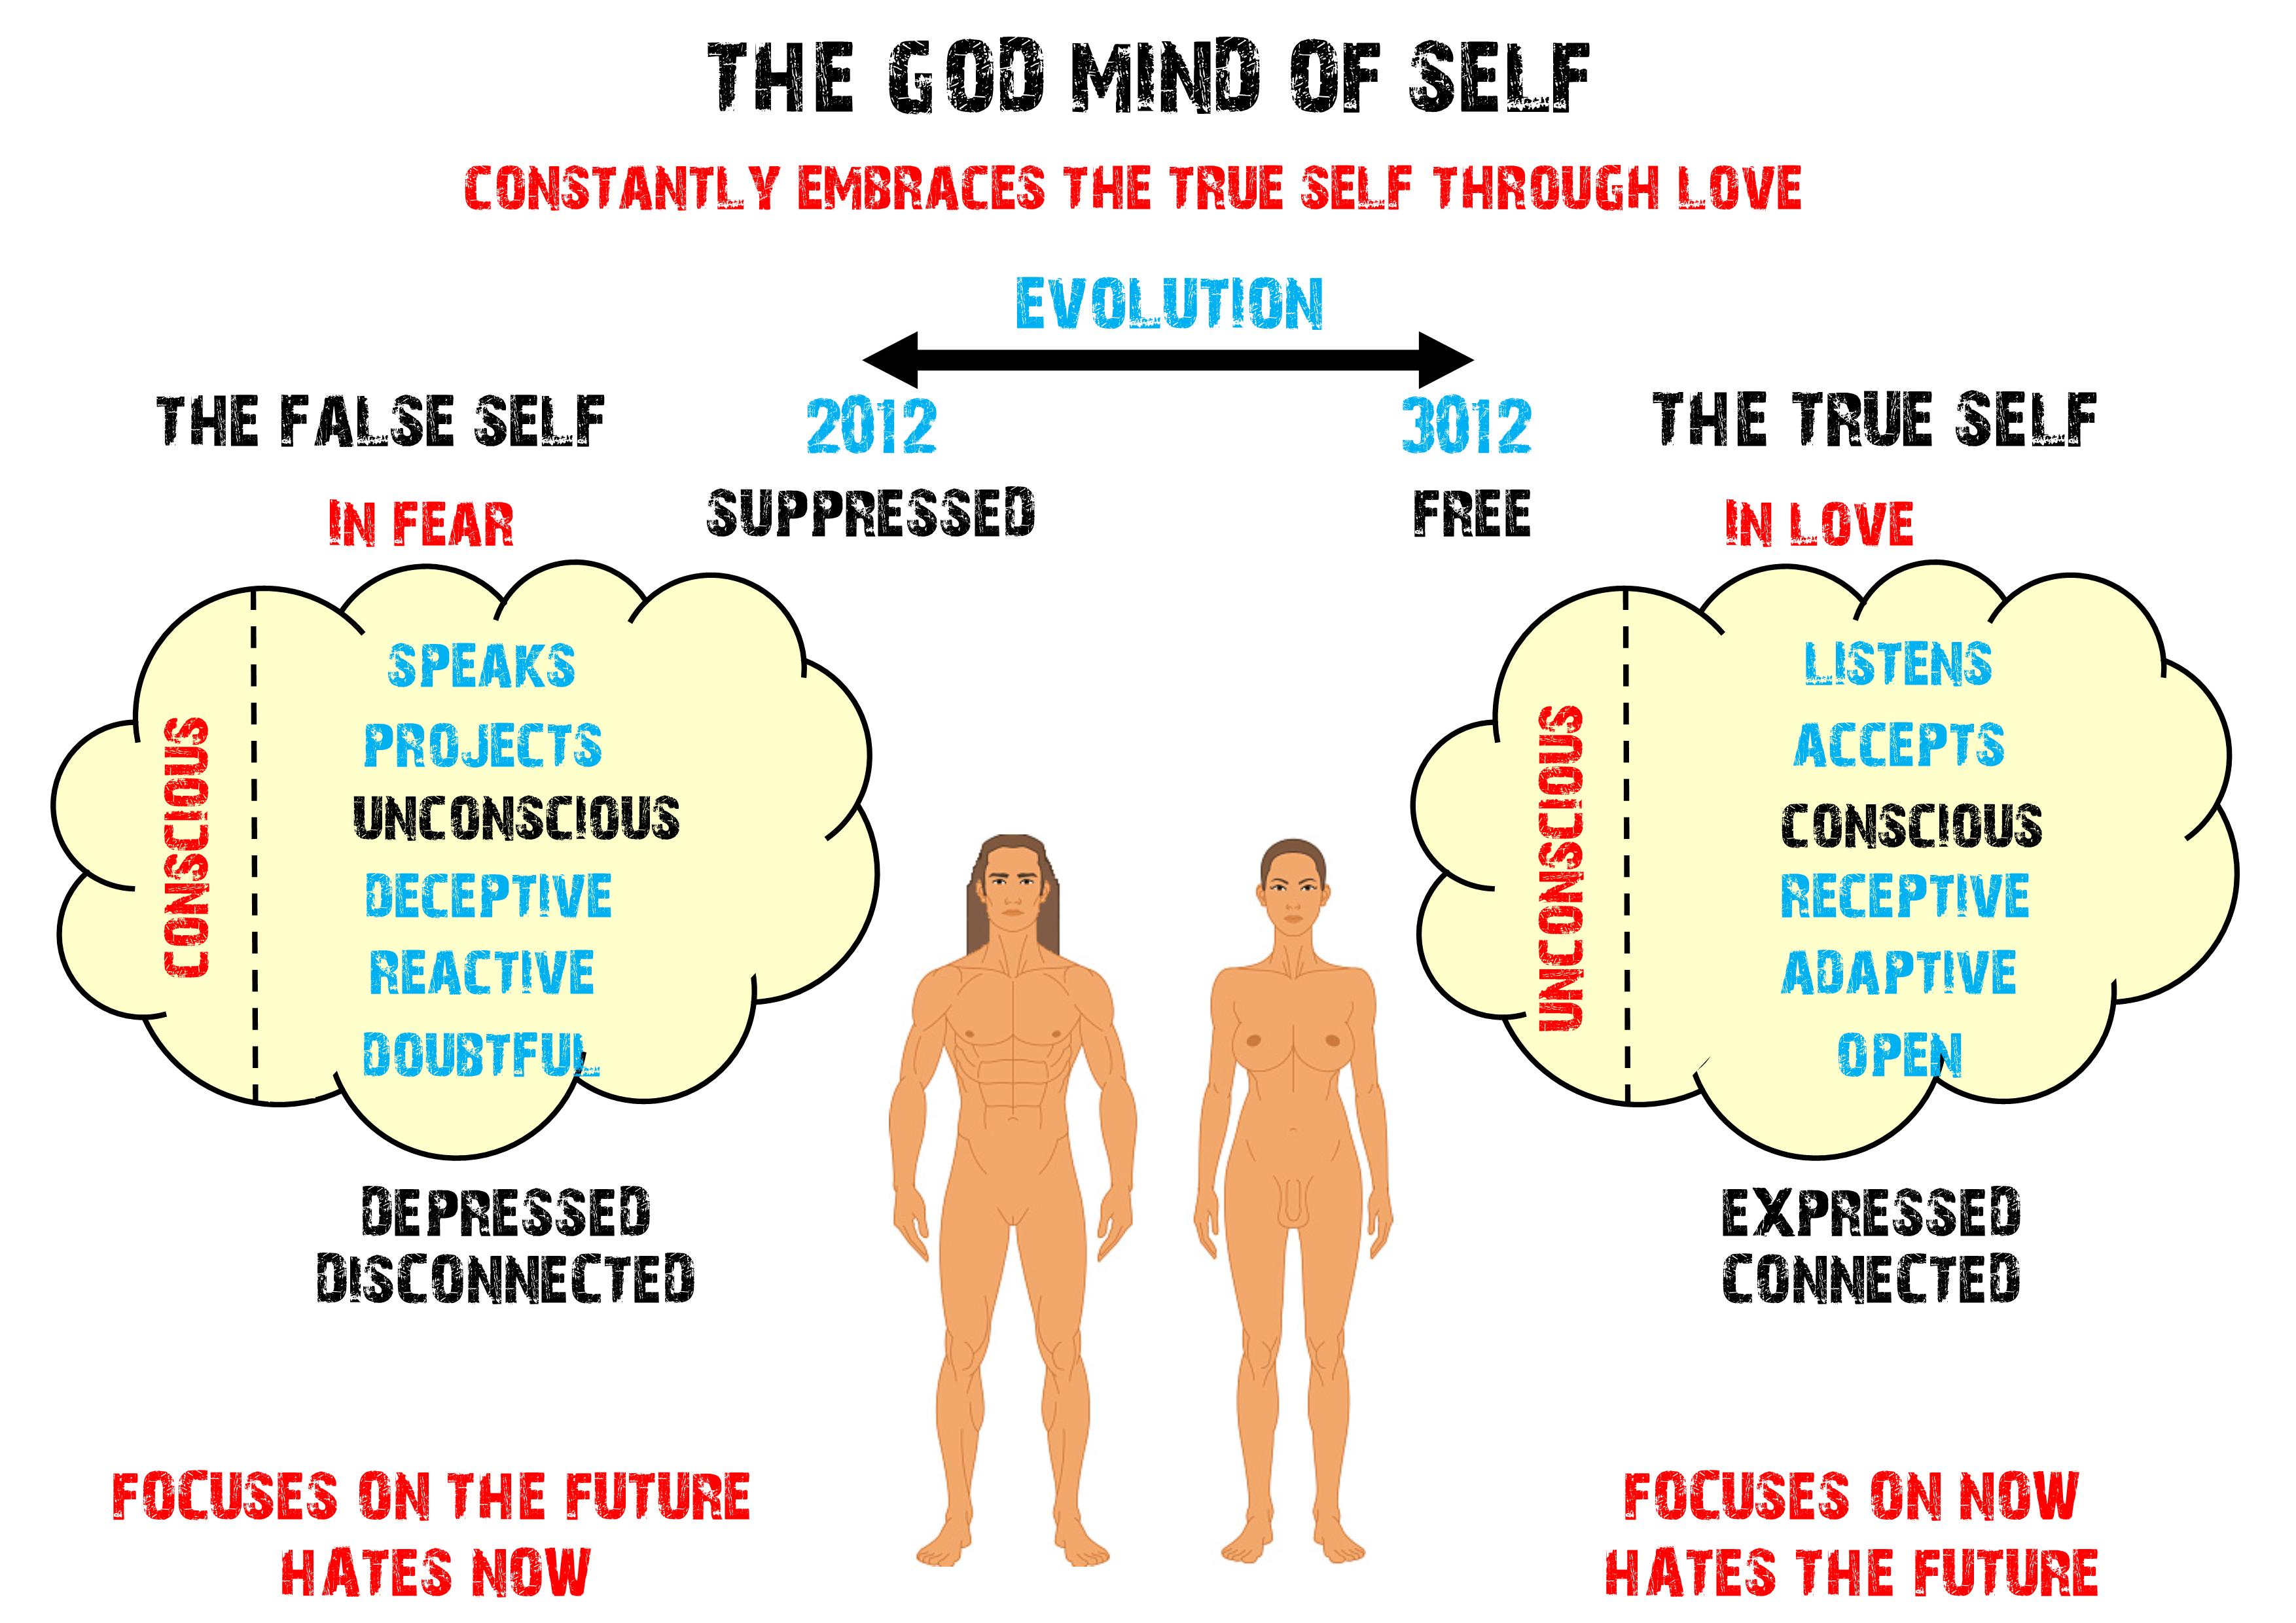 God Mind of Self